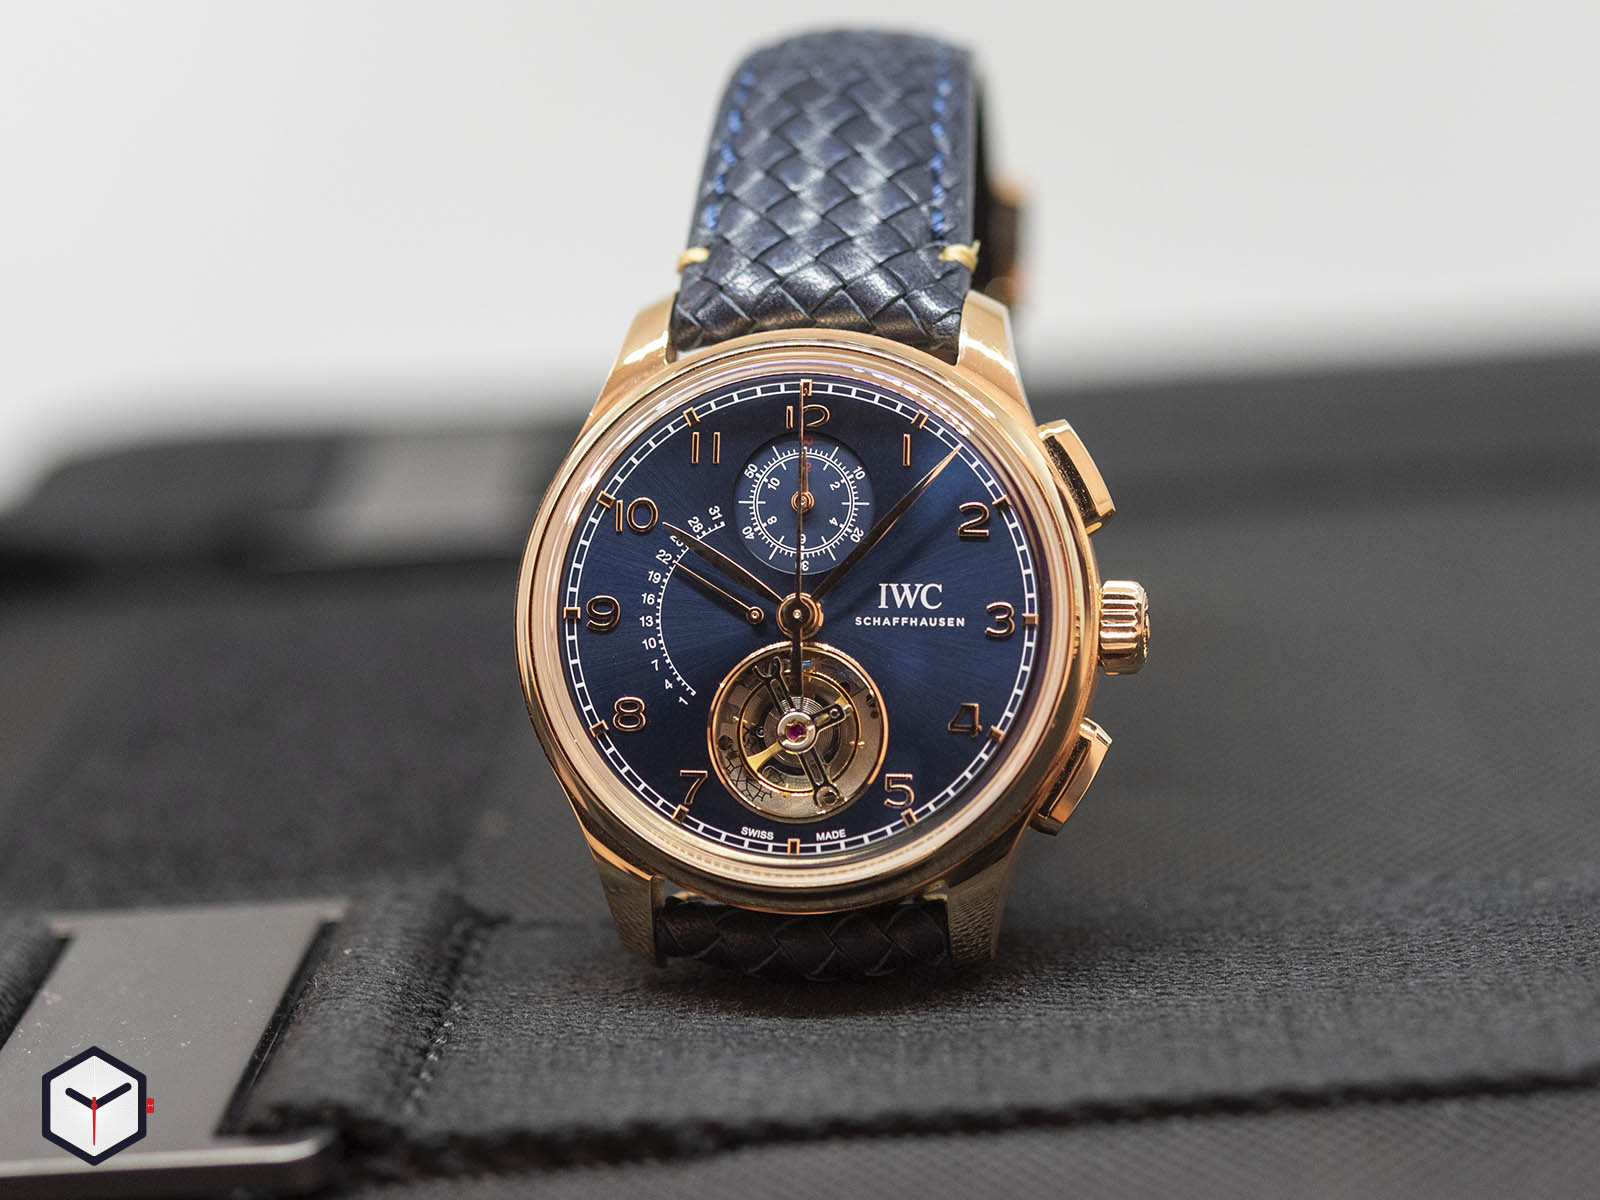 iw394005-iwc-portugieser-tourbillon-retrograde-chronograph-boutique-edition-2.jpg